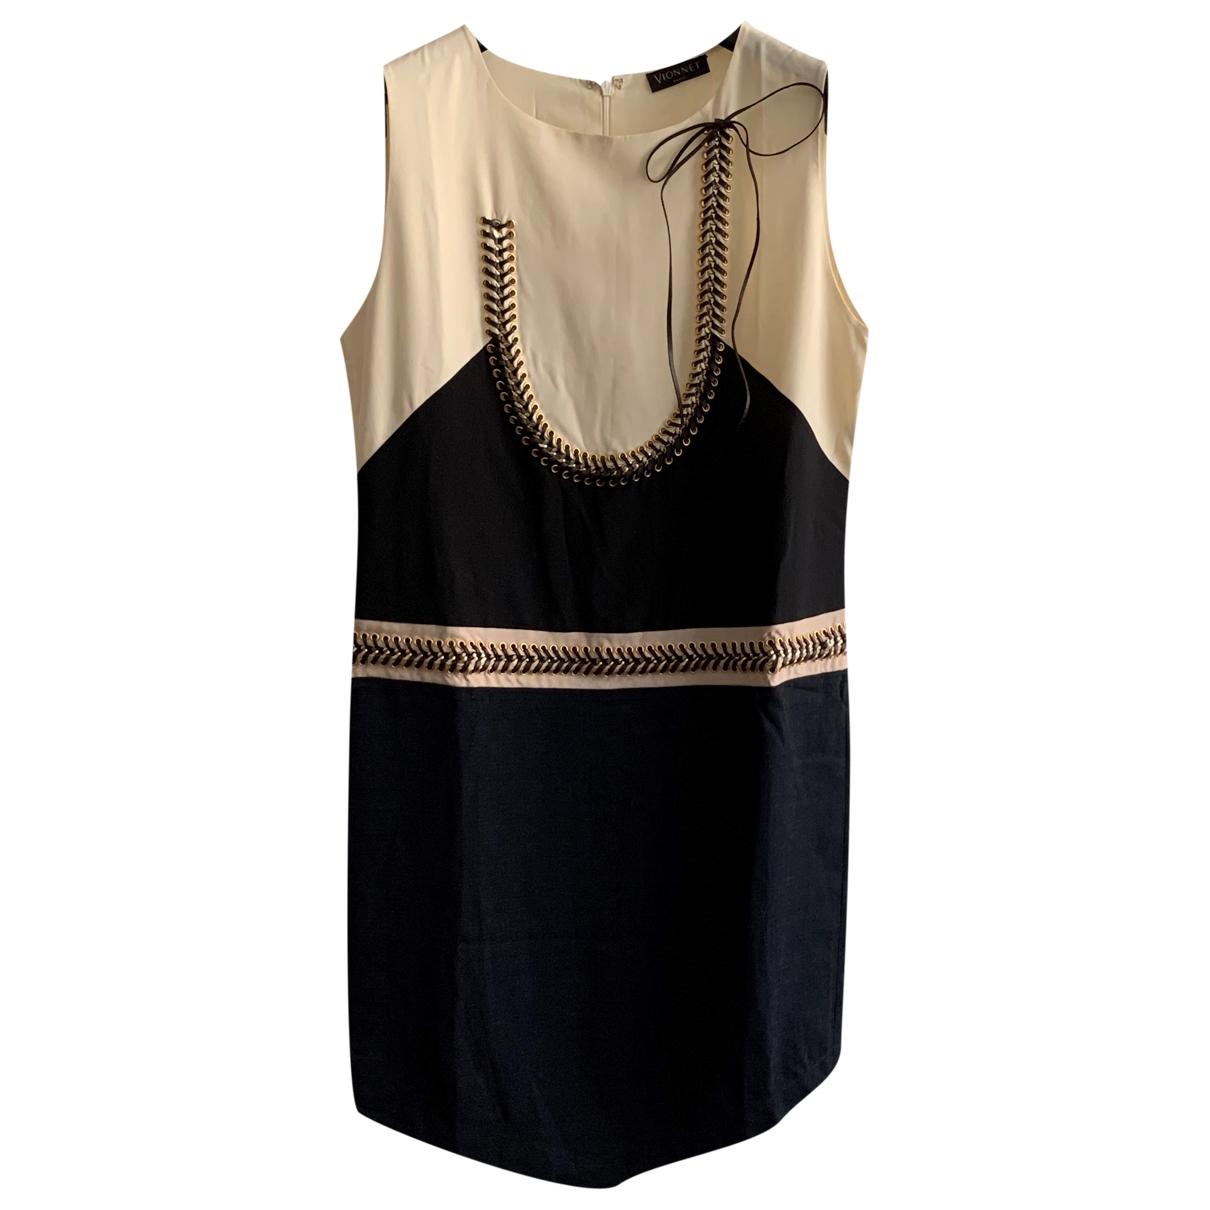 Vionnet \N Multicolour dress for Women 42 IT